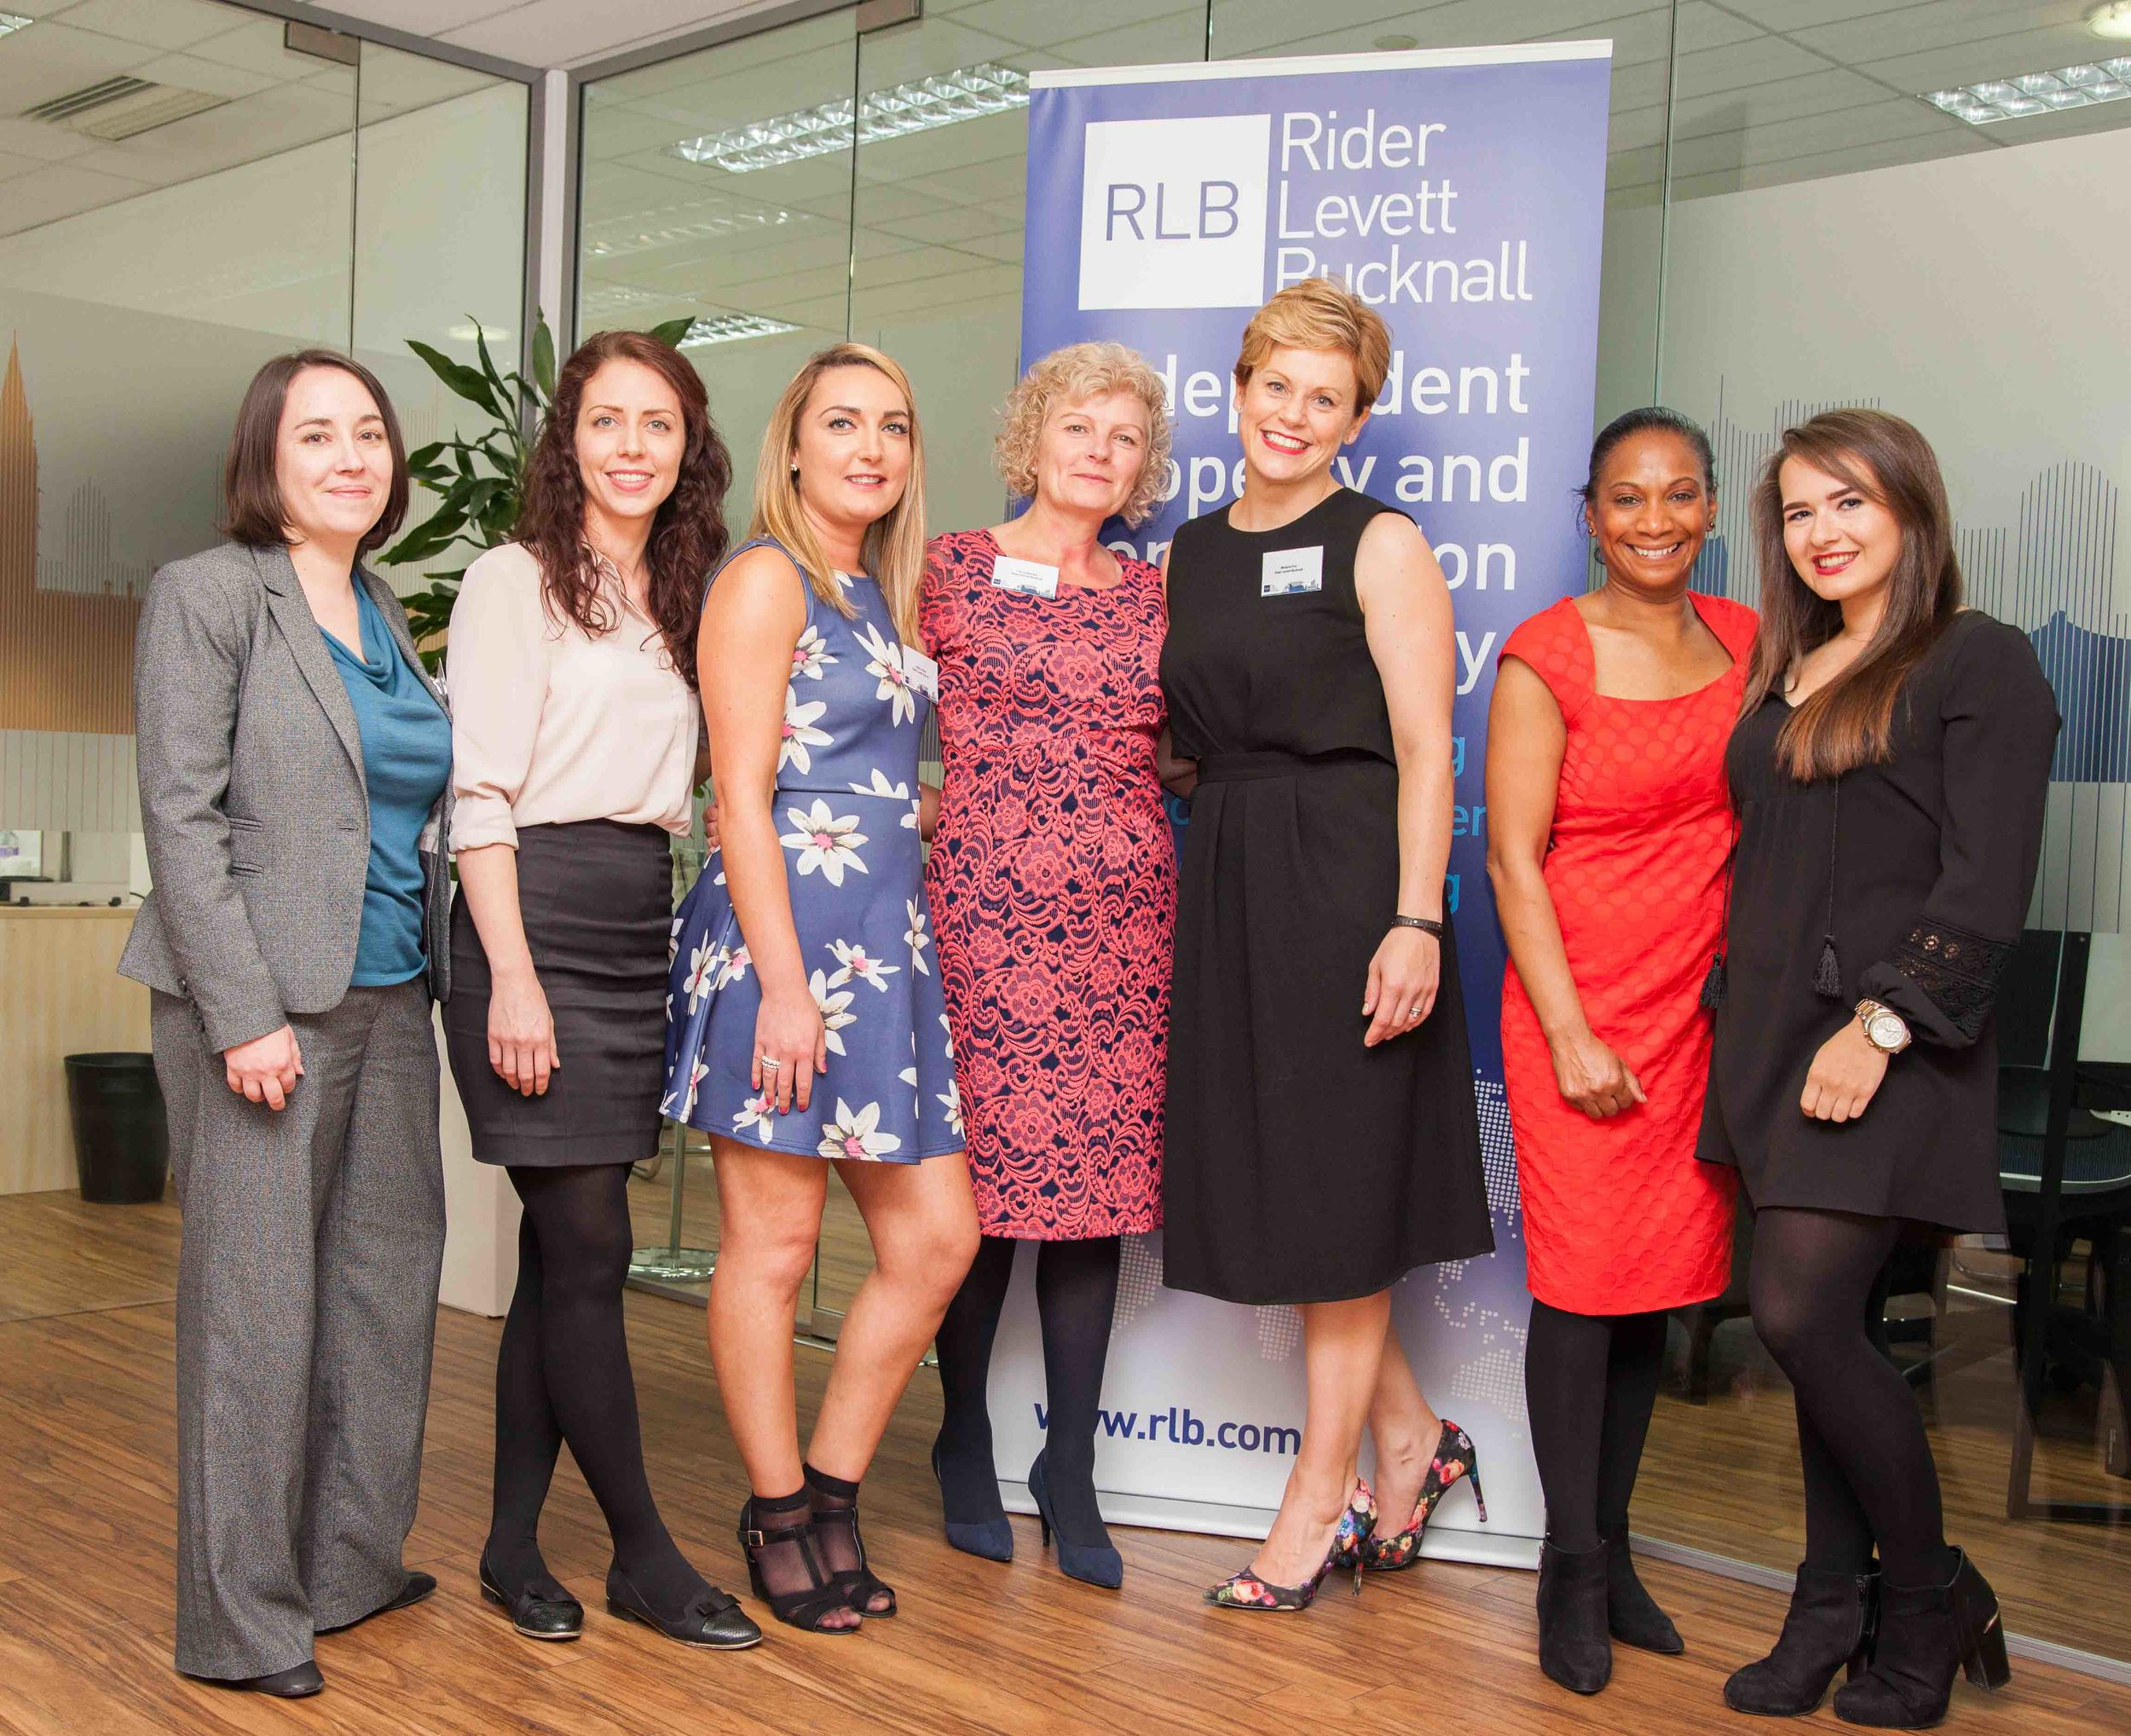 RLB Ladies Event Oct 15_12_©Matthew Nichol Photography.jpg